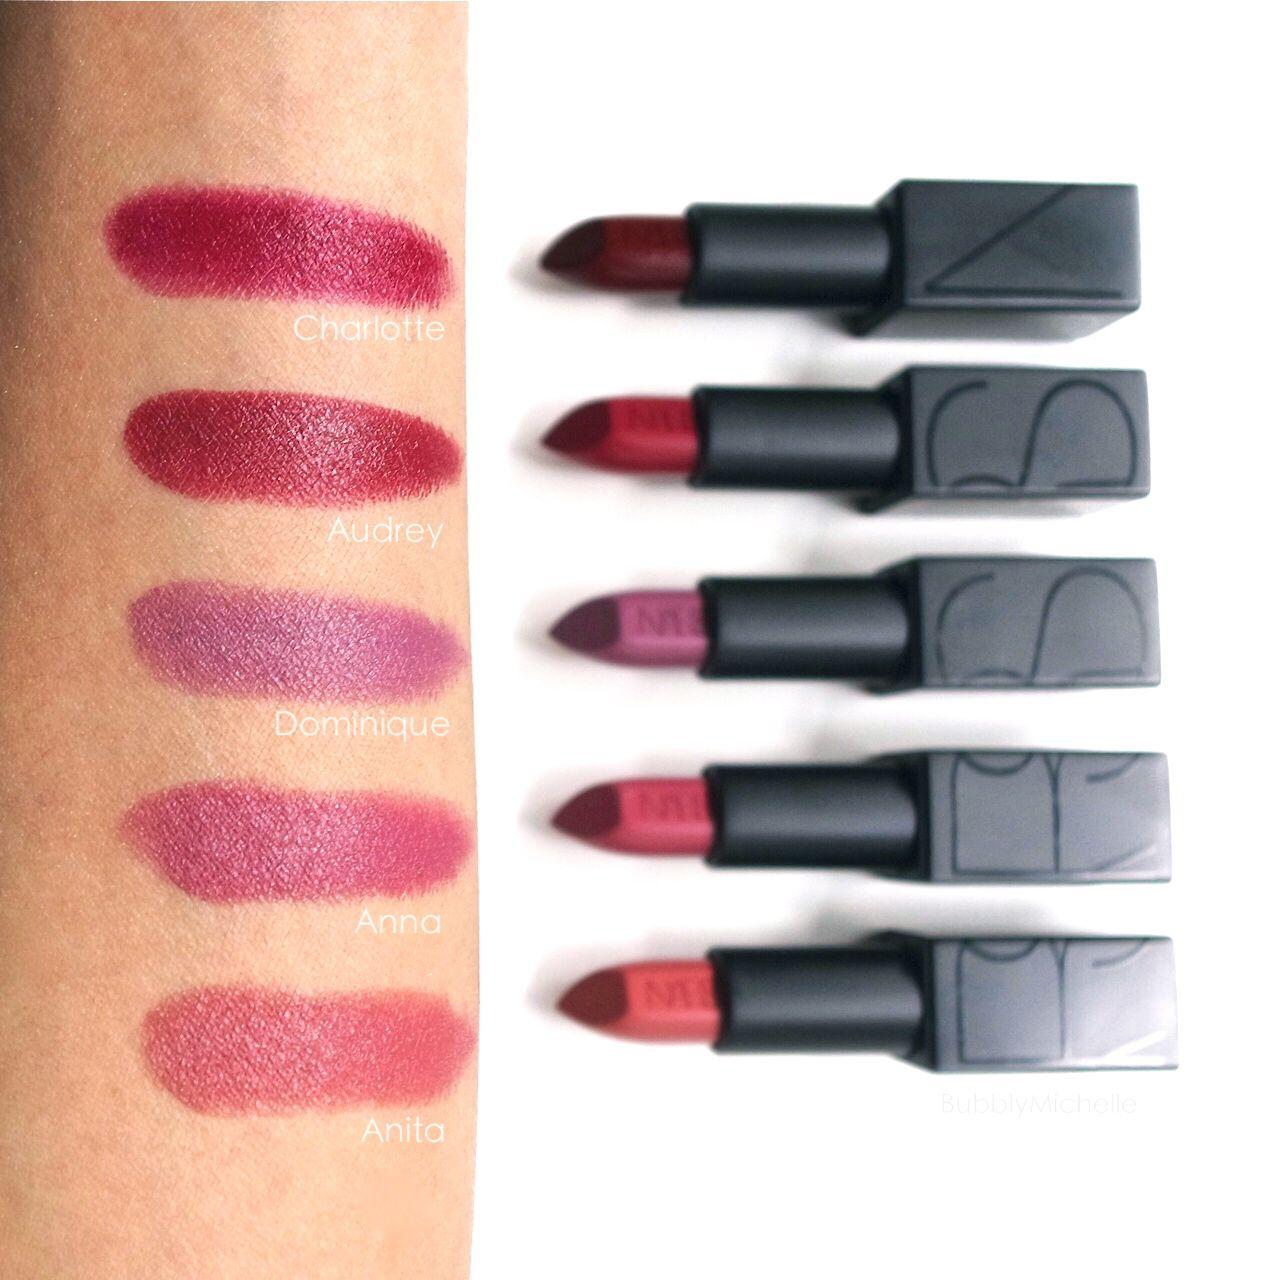 Nars Audacious Lipstick In Charlotte Skin And Make Up Nars